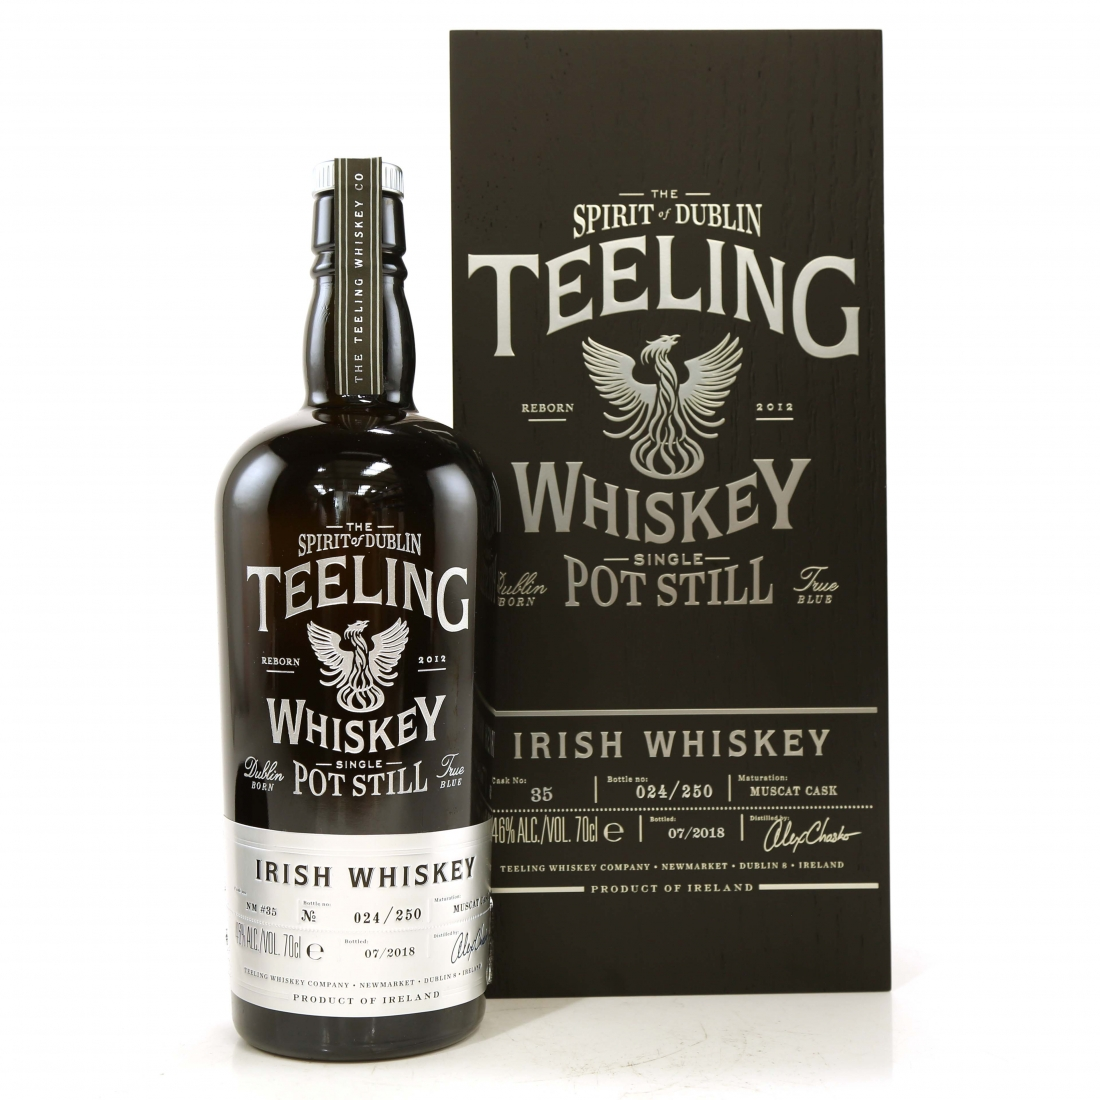 Teeling Celebratory Single Pot Still Whiskey / Bottle #024